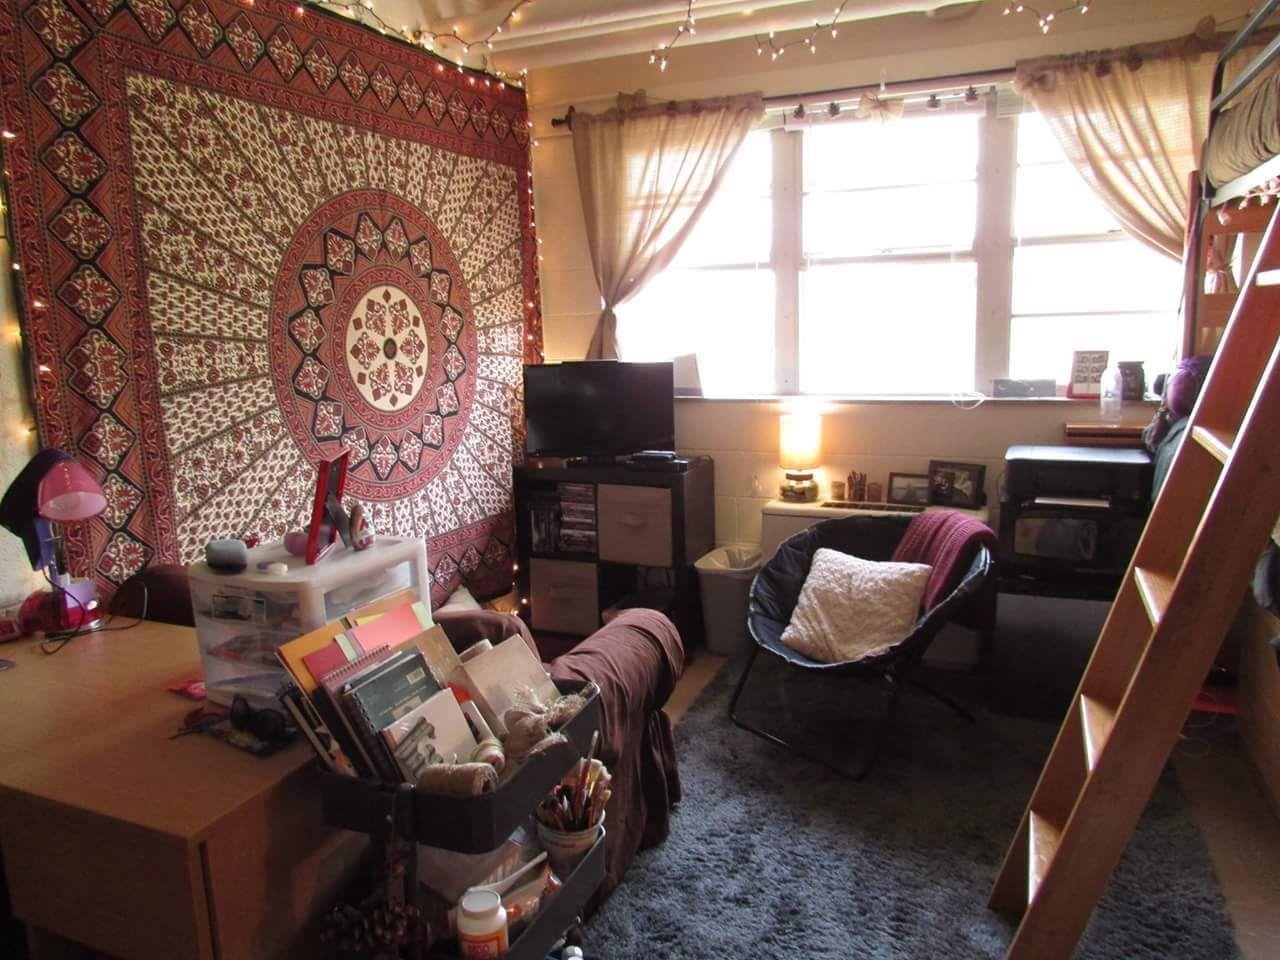 20 Amazing Ksu Dorm Rooms For Dorm Decor Inspiration Society19 Single Dorm Room Cool Dorm Rooms Ksu Dorm